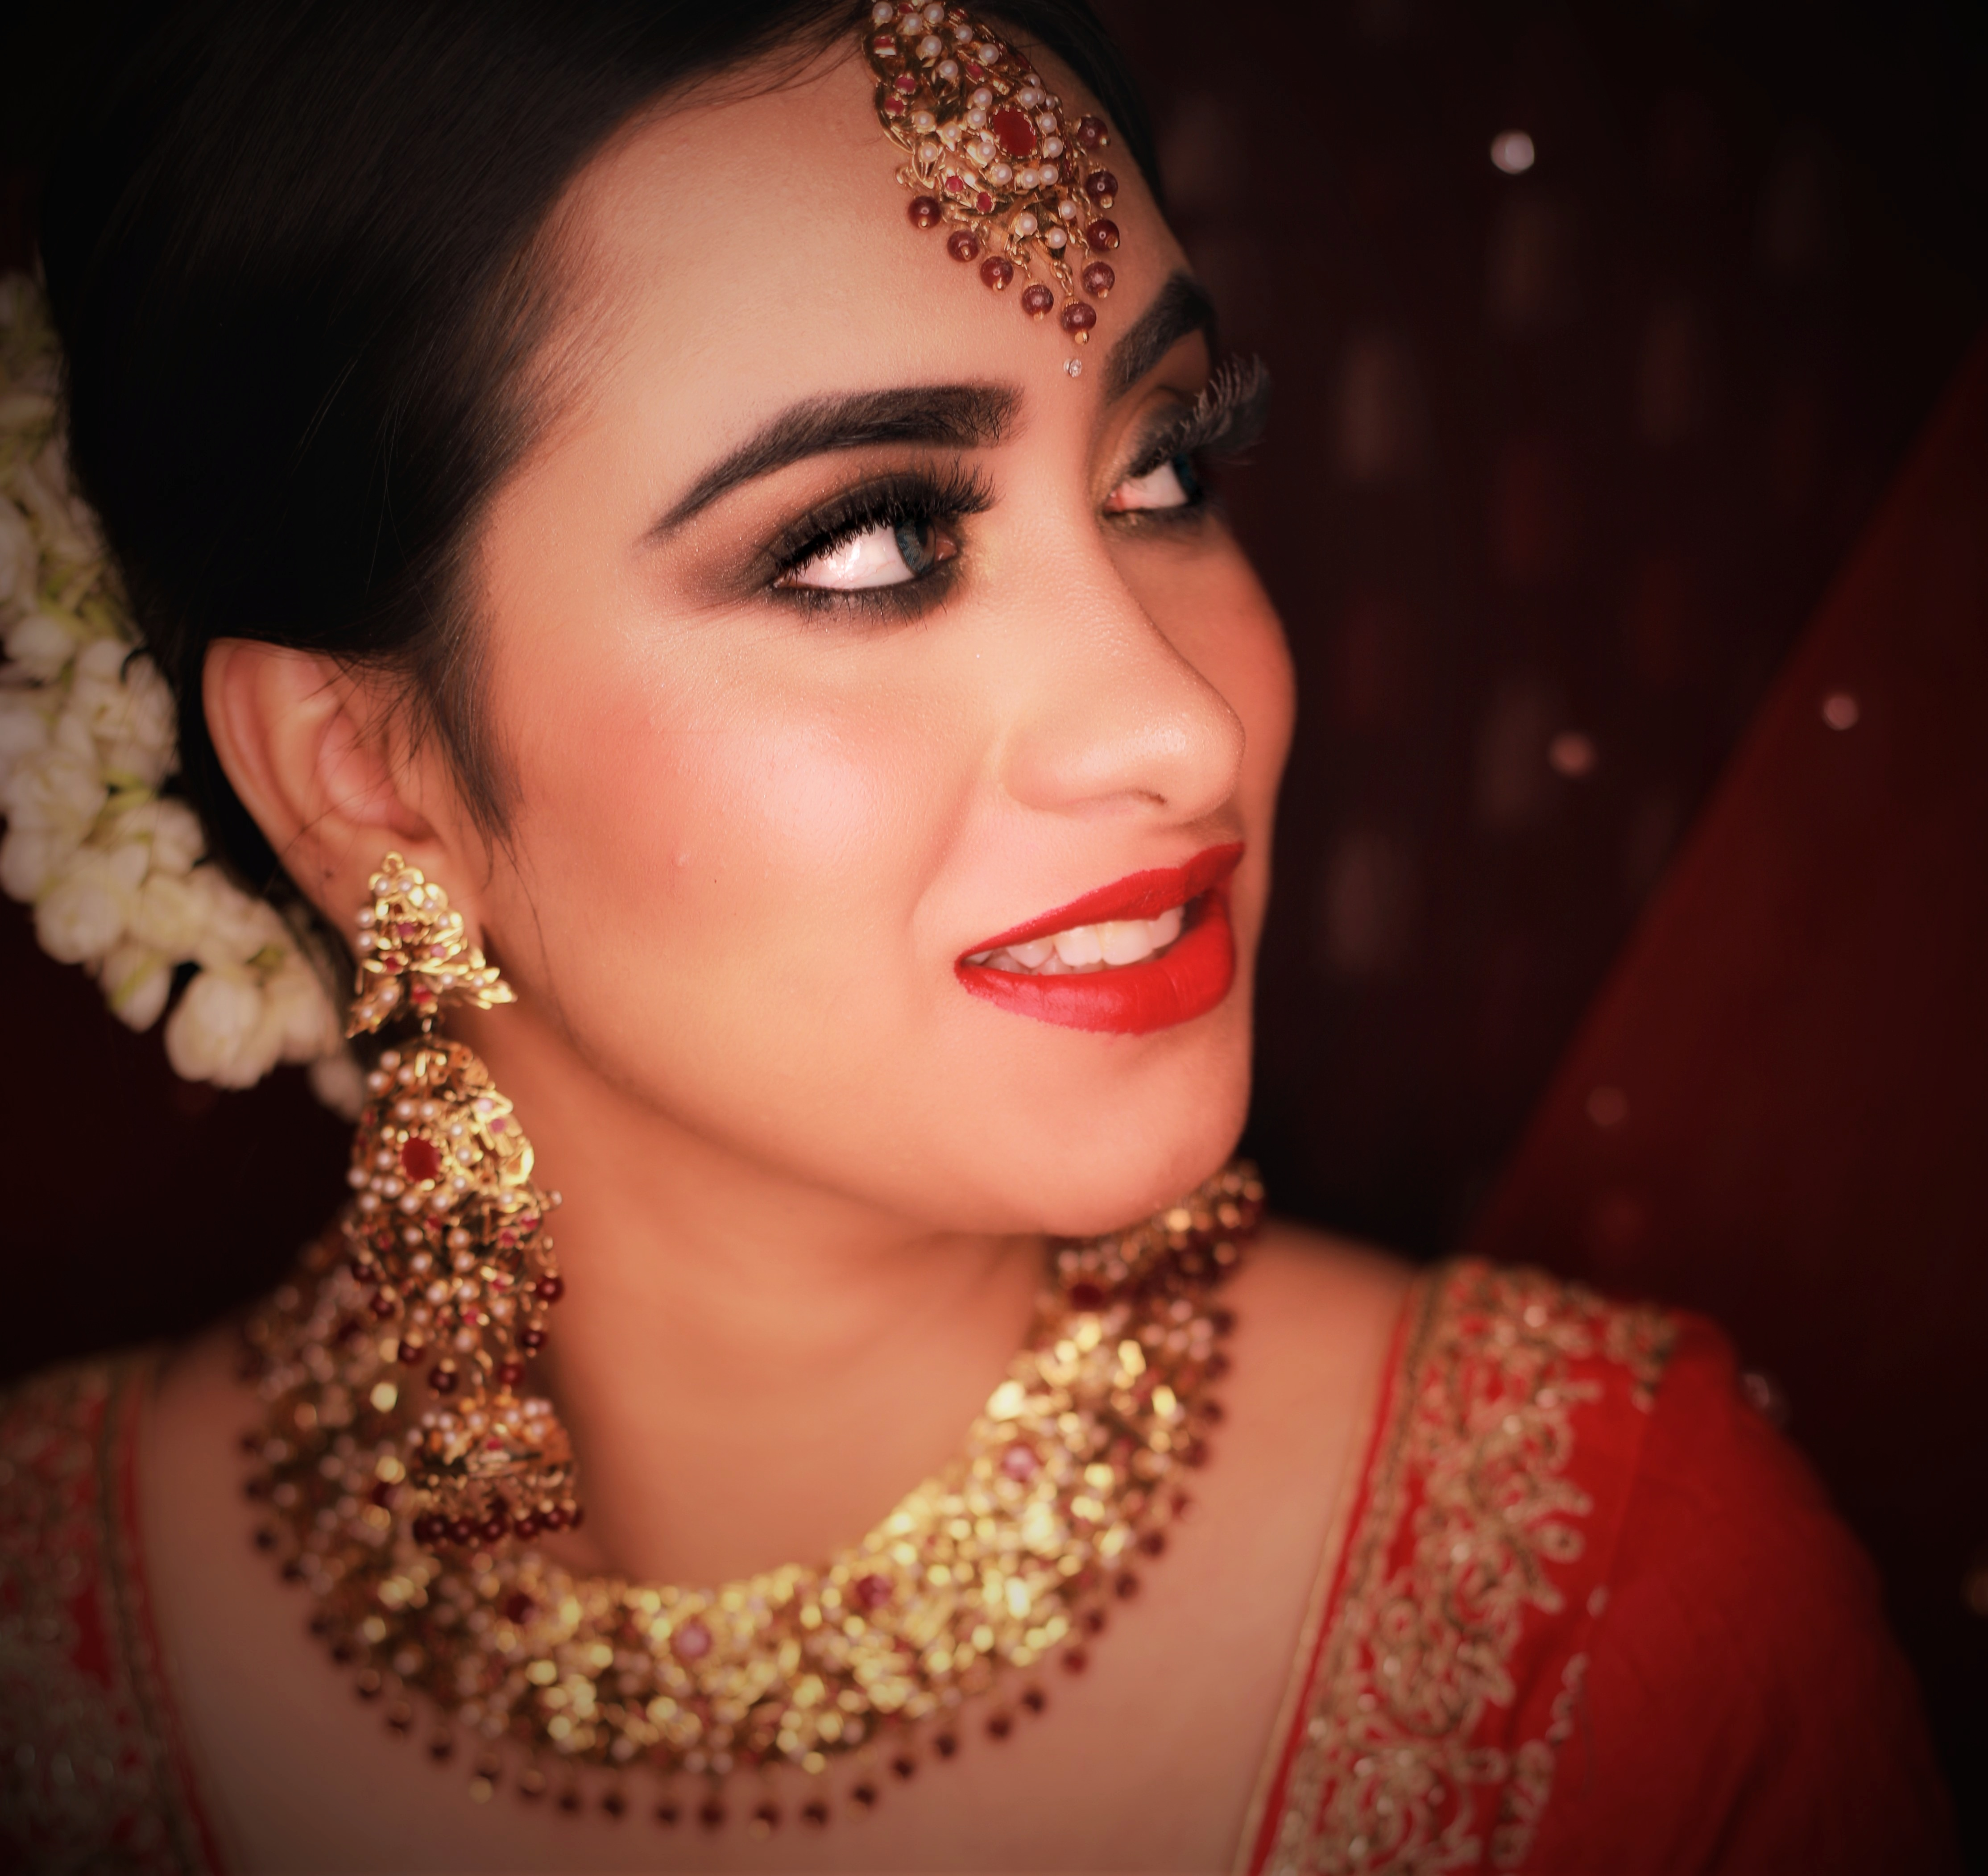 kritika-surma-makeup-artist-delhi-ncr